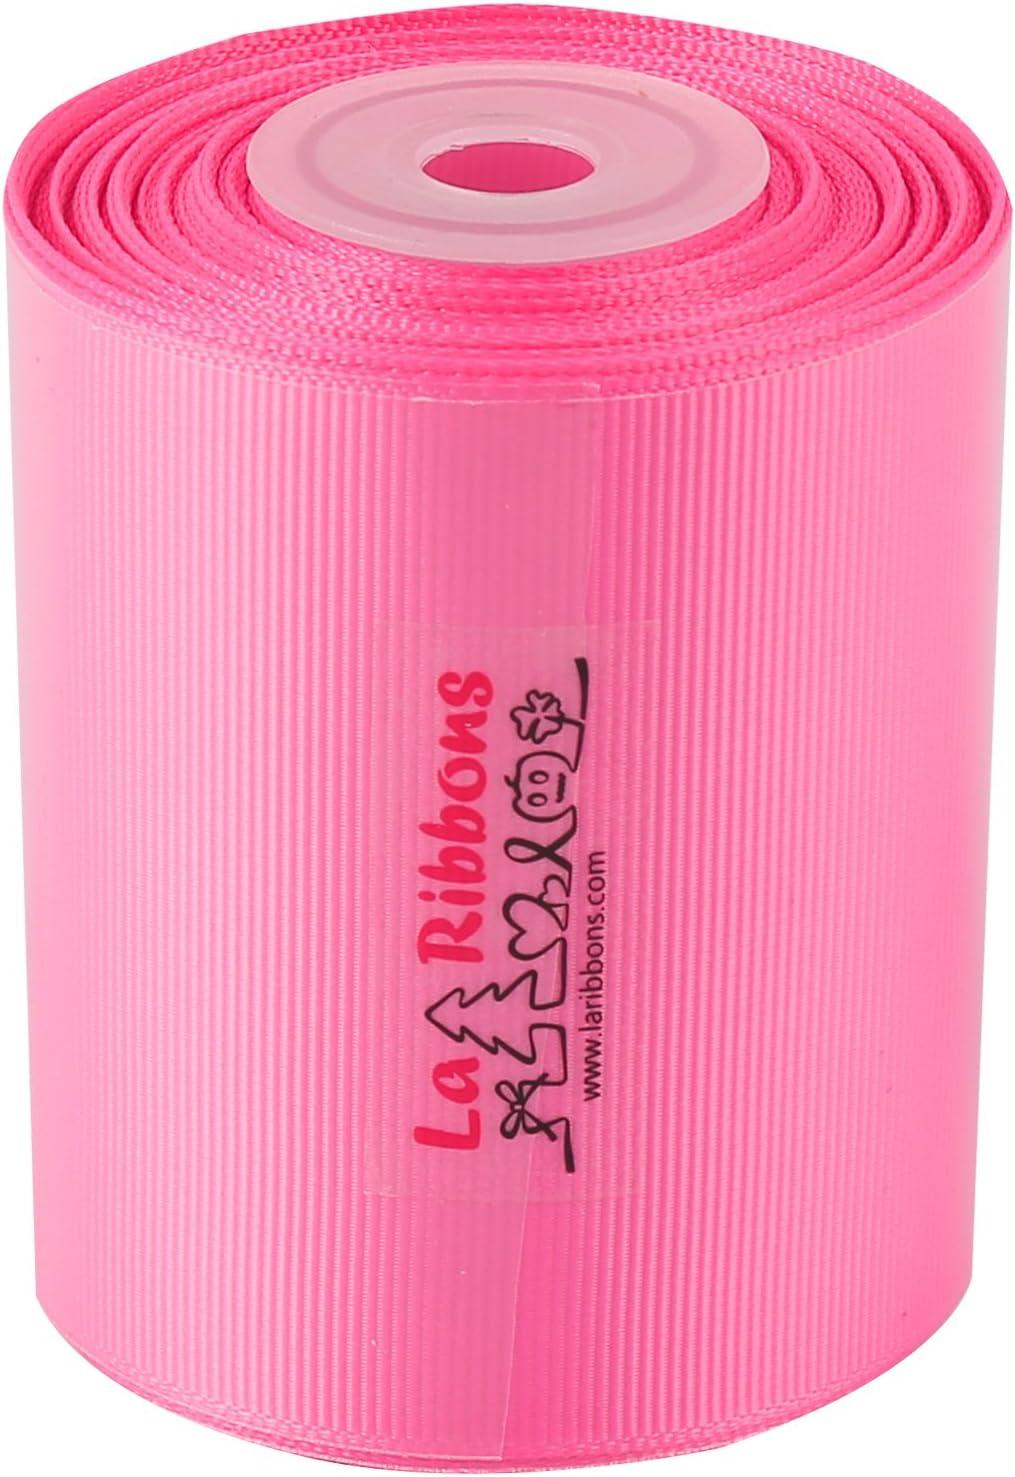 156 Hot Pink Laribbons 3 Inch Wide Solid Color Grosgrain Ribbon 10 Yard//Spool